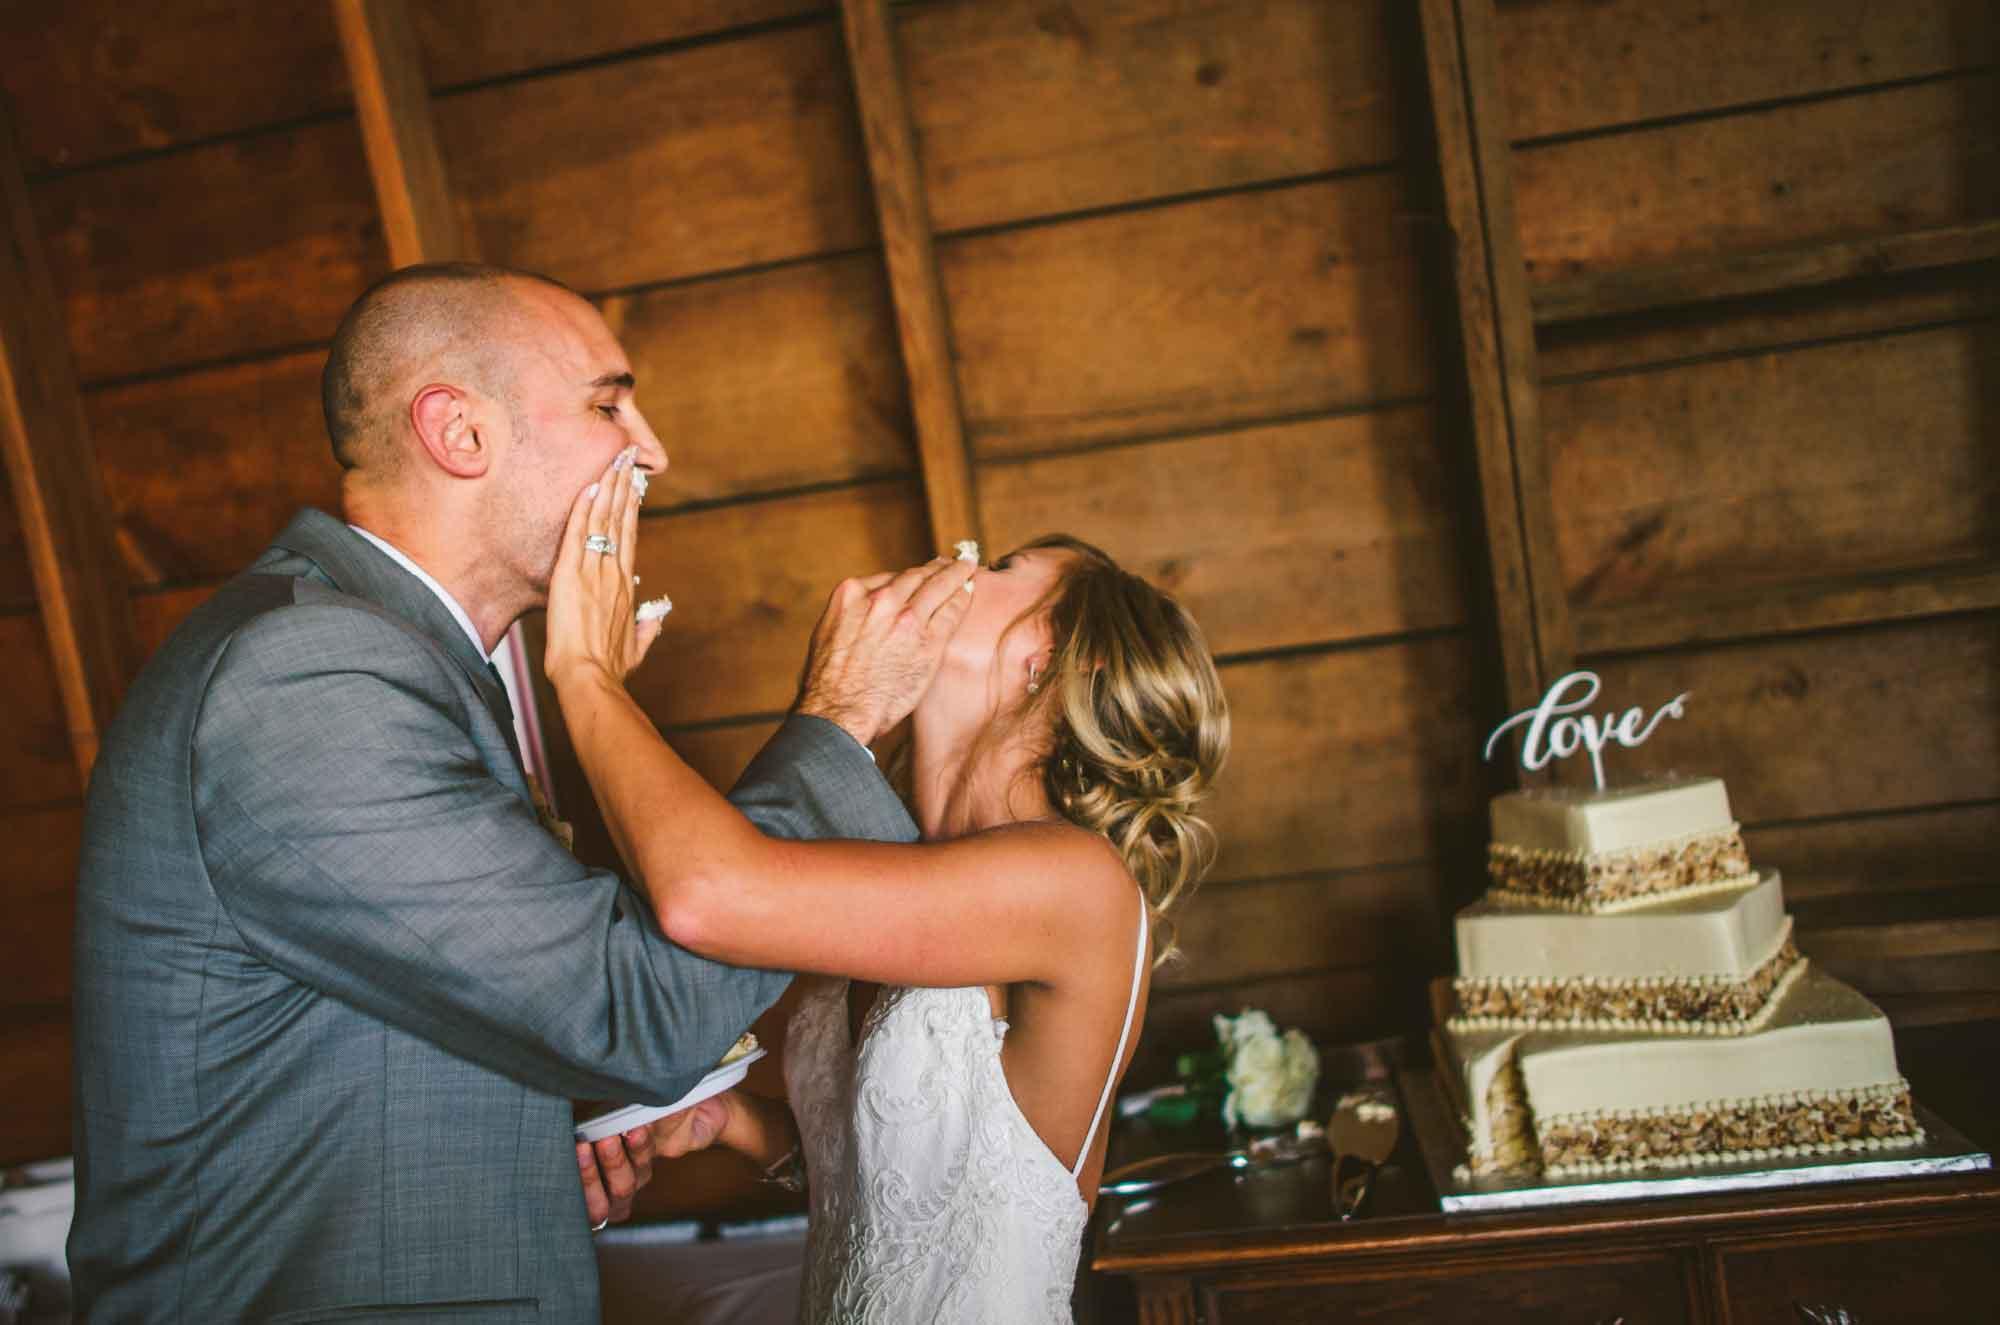 20-cake-smash-wedding-reception.jpg